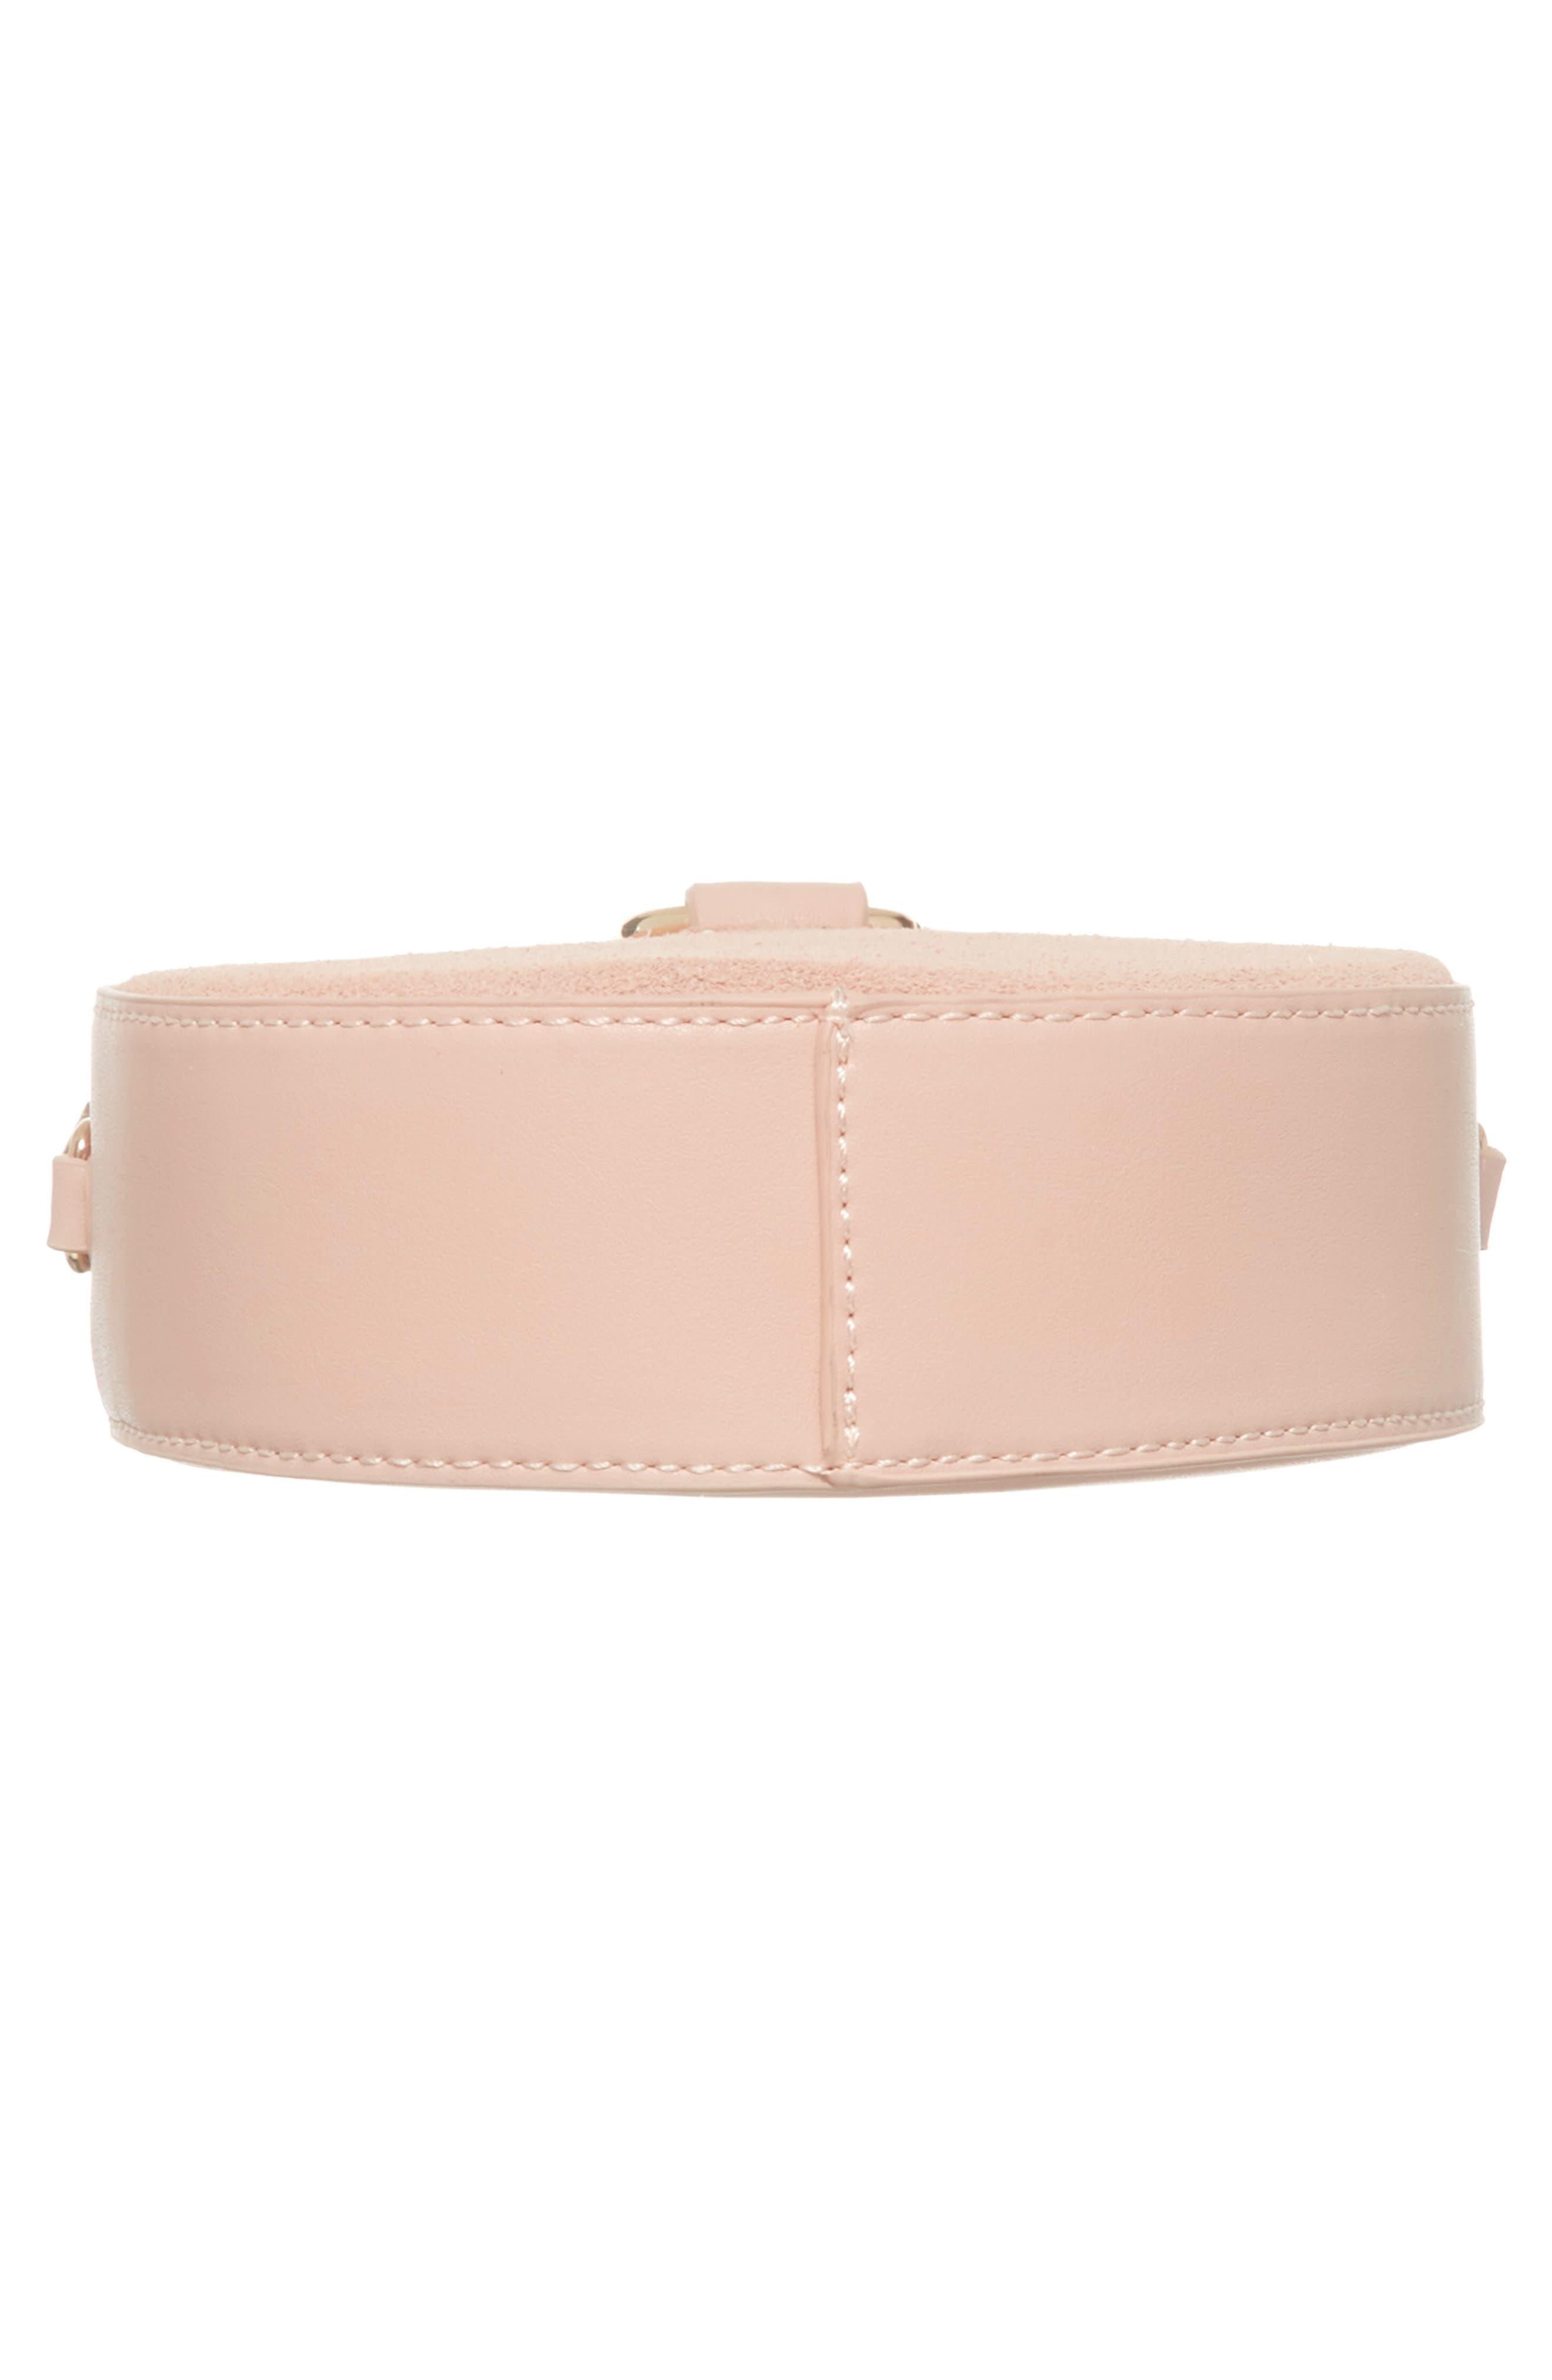 Circle Bag with Wristlet,                             Alternate thumbnail 6, color,                             Tan